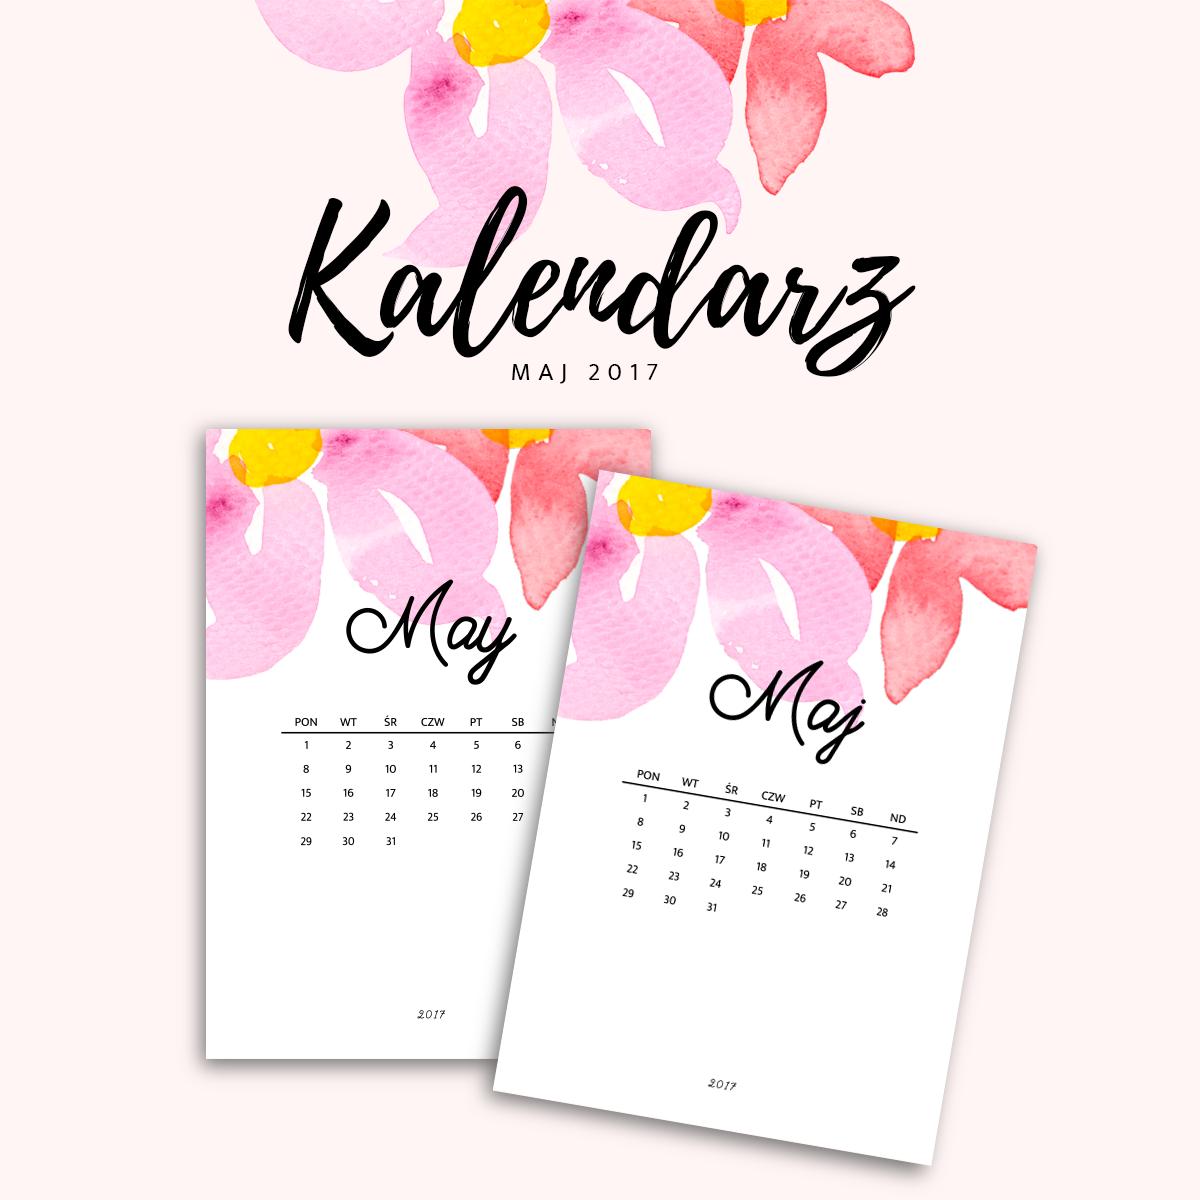 Kalendarz do druku - maj 2017 {do pobrania za darmo}